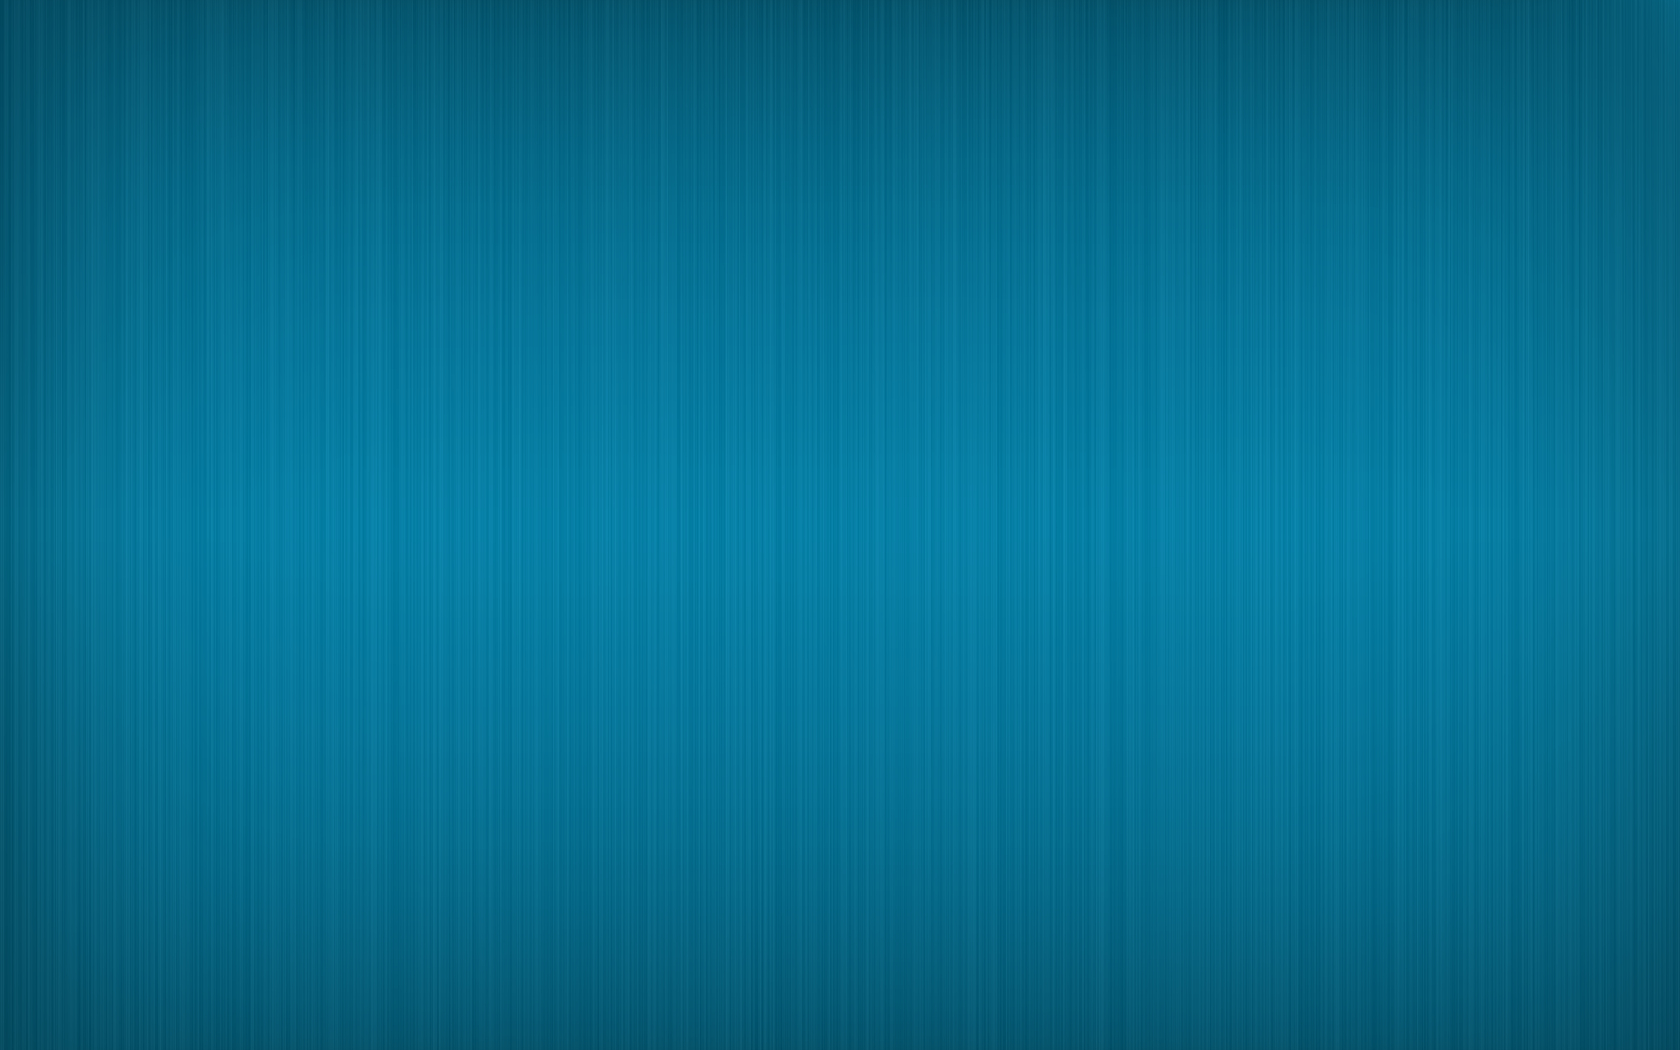 plain blue wallpaper HD 1680x1050